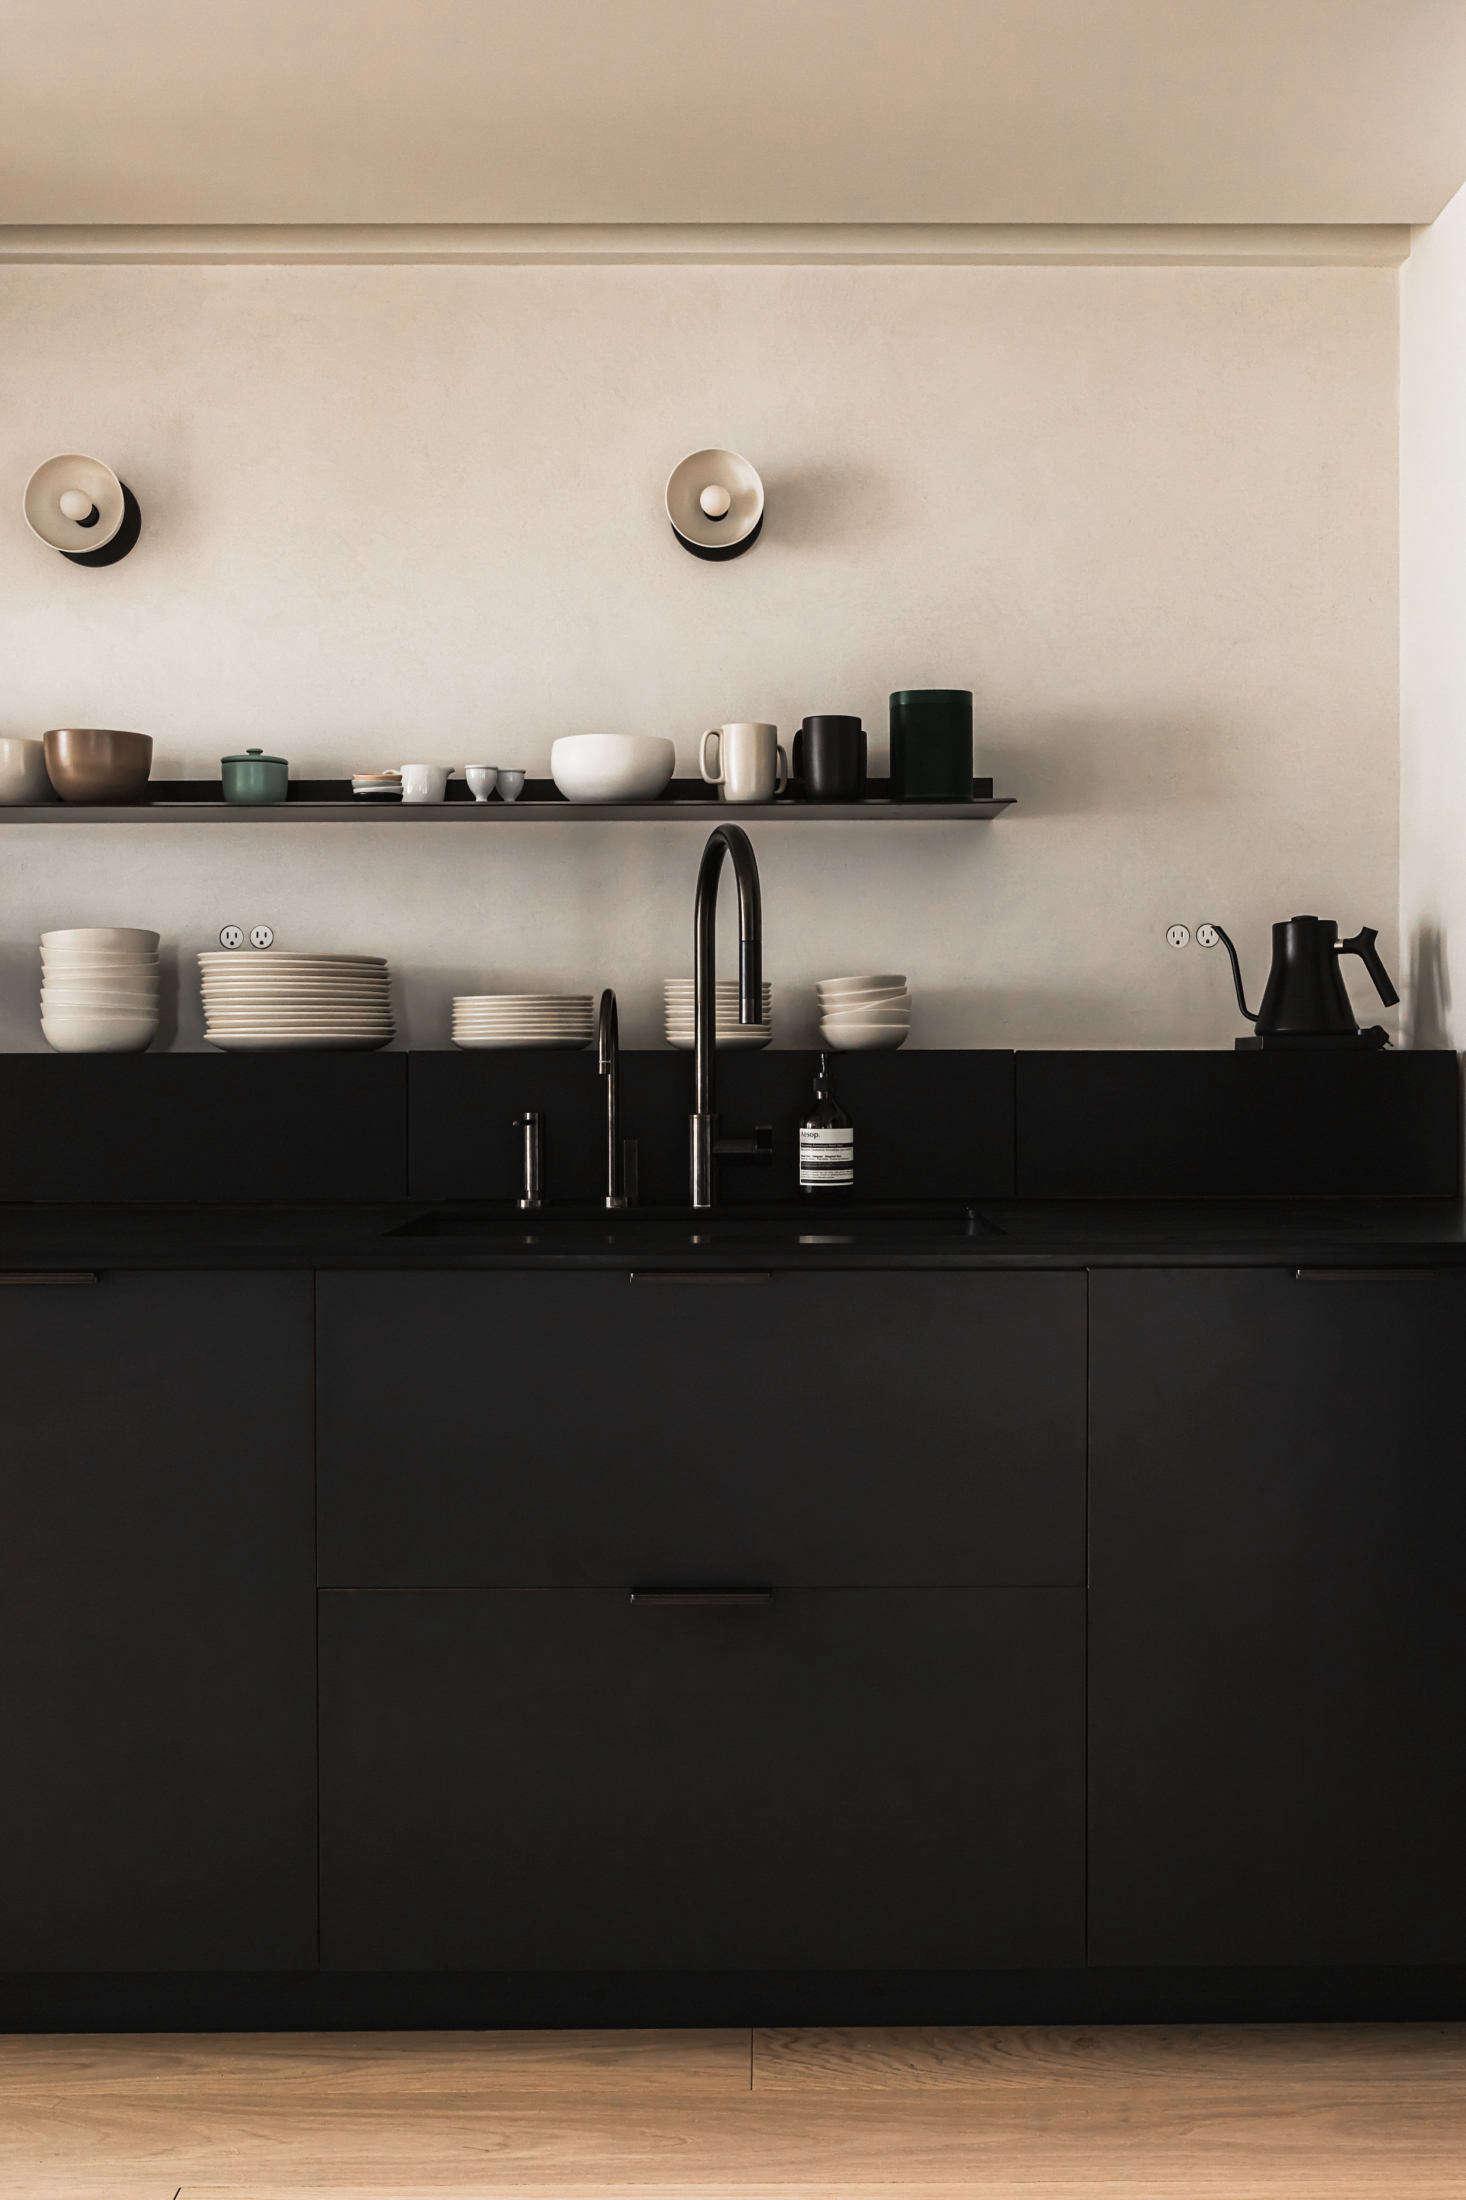 The minimal Henrybuilt kitchen in tone-on-tone black. &#8